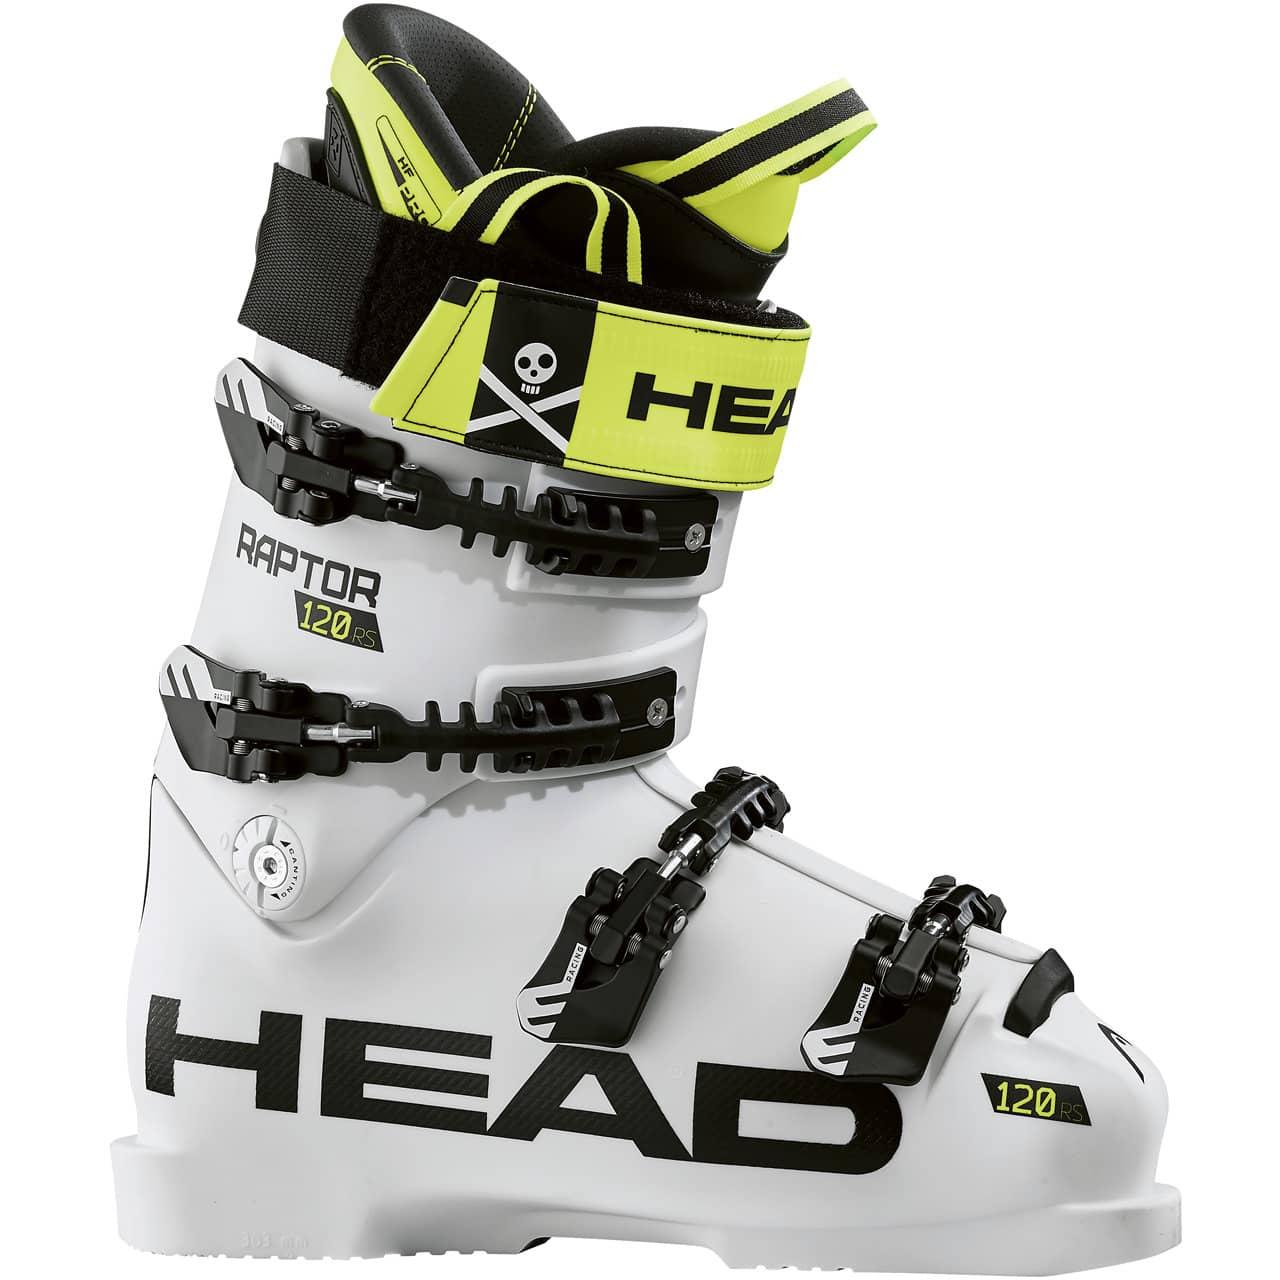 Head next Edge XP W Ski Boots Damen-Skischuhe Ski Boots Ski Boots Shoes Boots